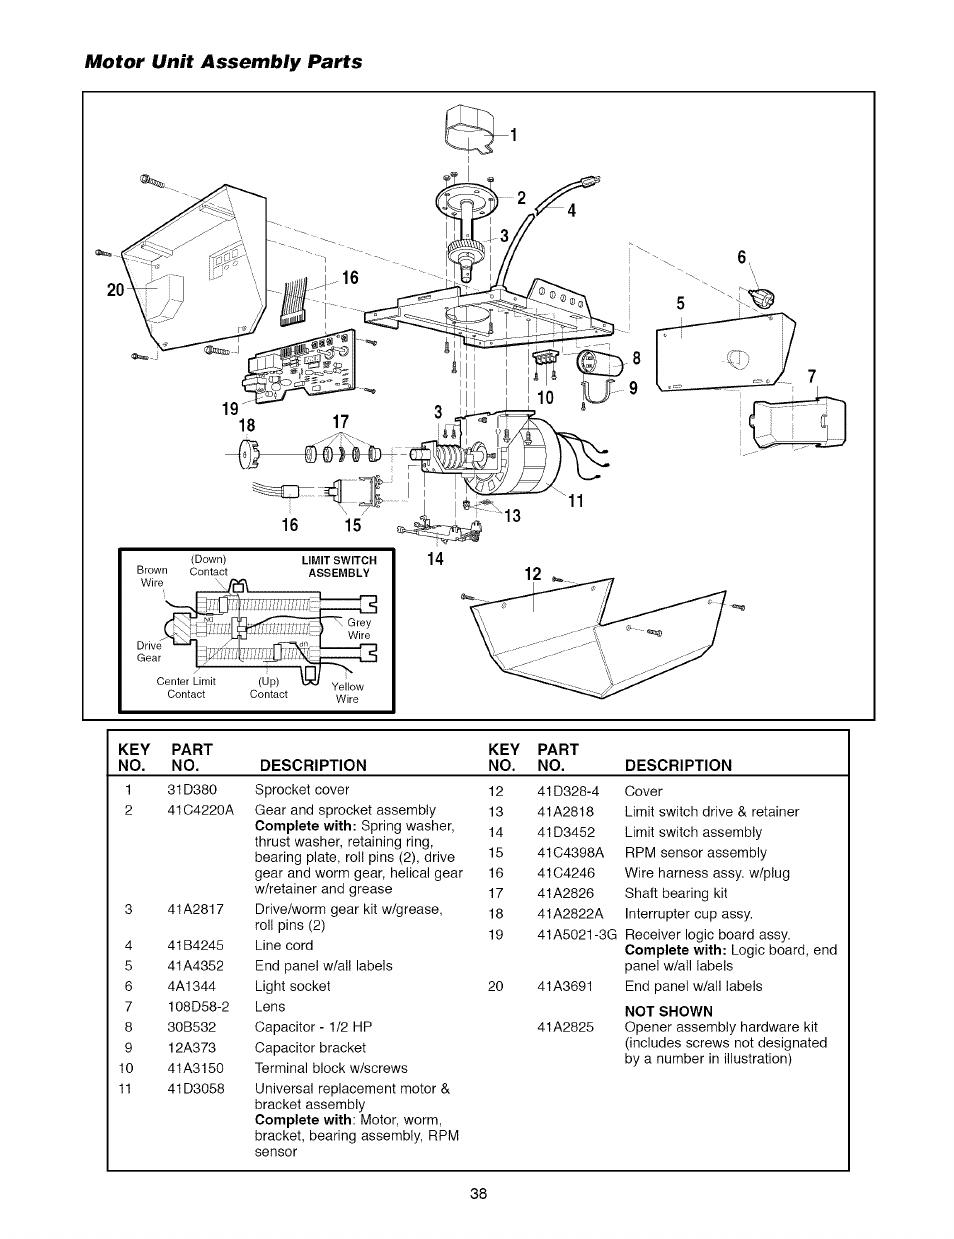 Motor unît assembly parts, Motor unit assembly parts